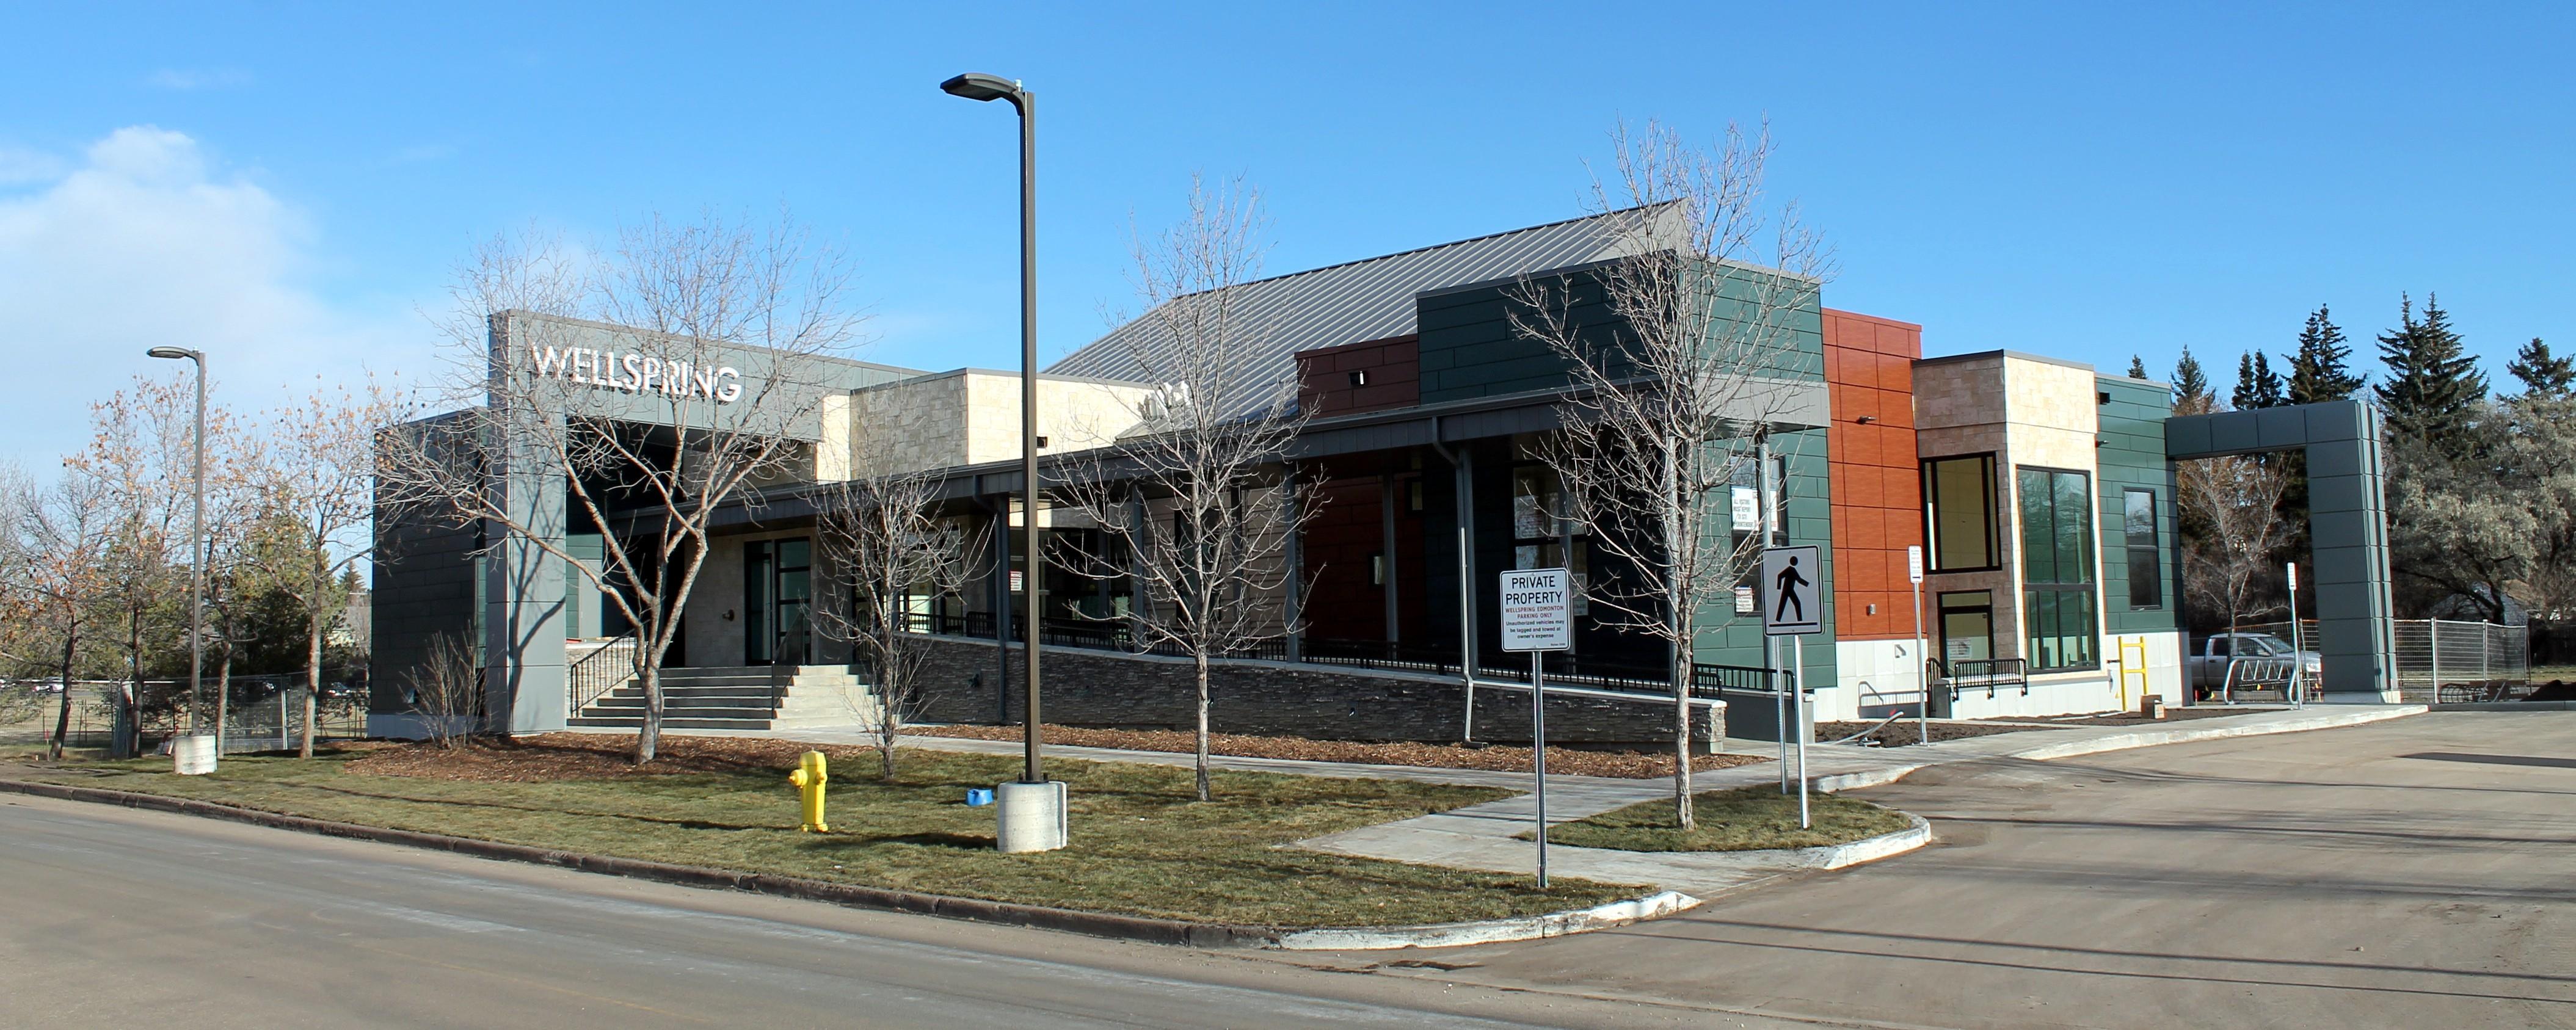 Home Health Care Edmonton Alberta  Ave